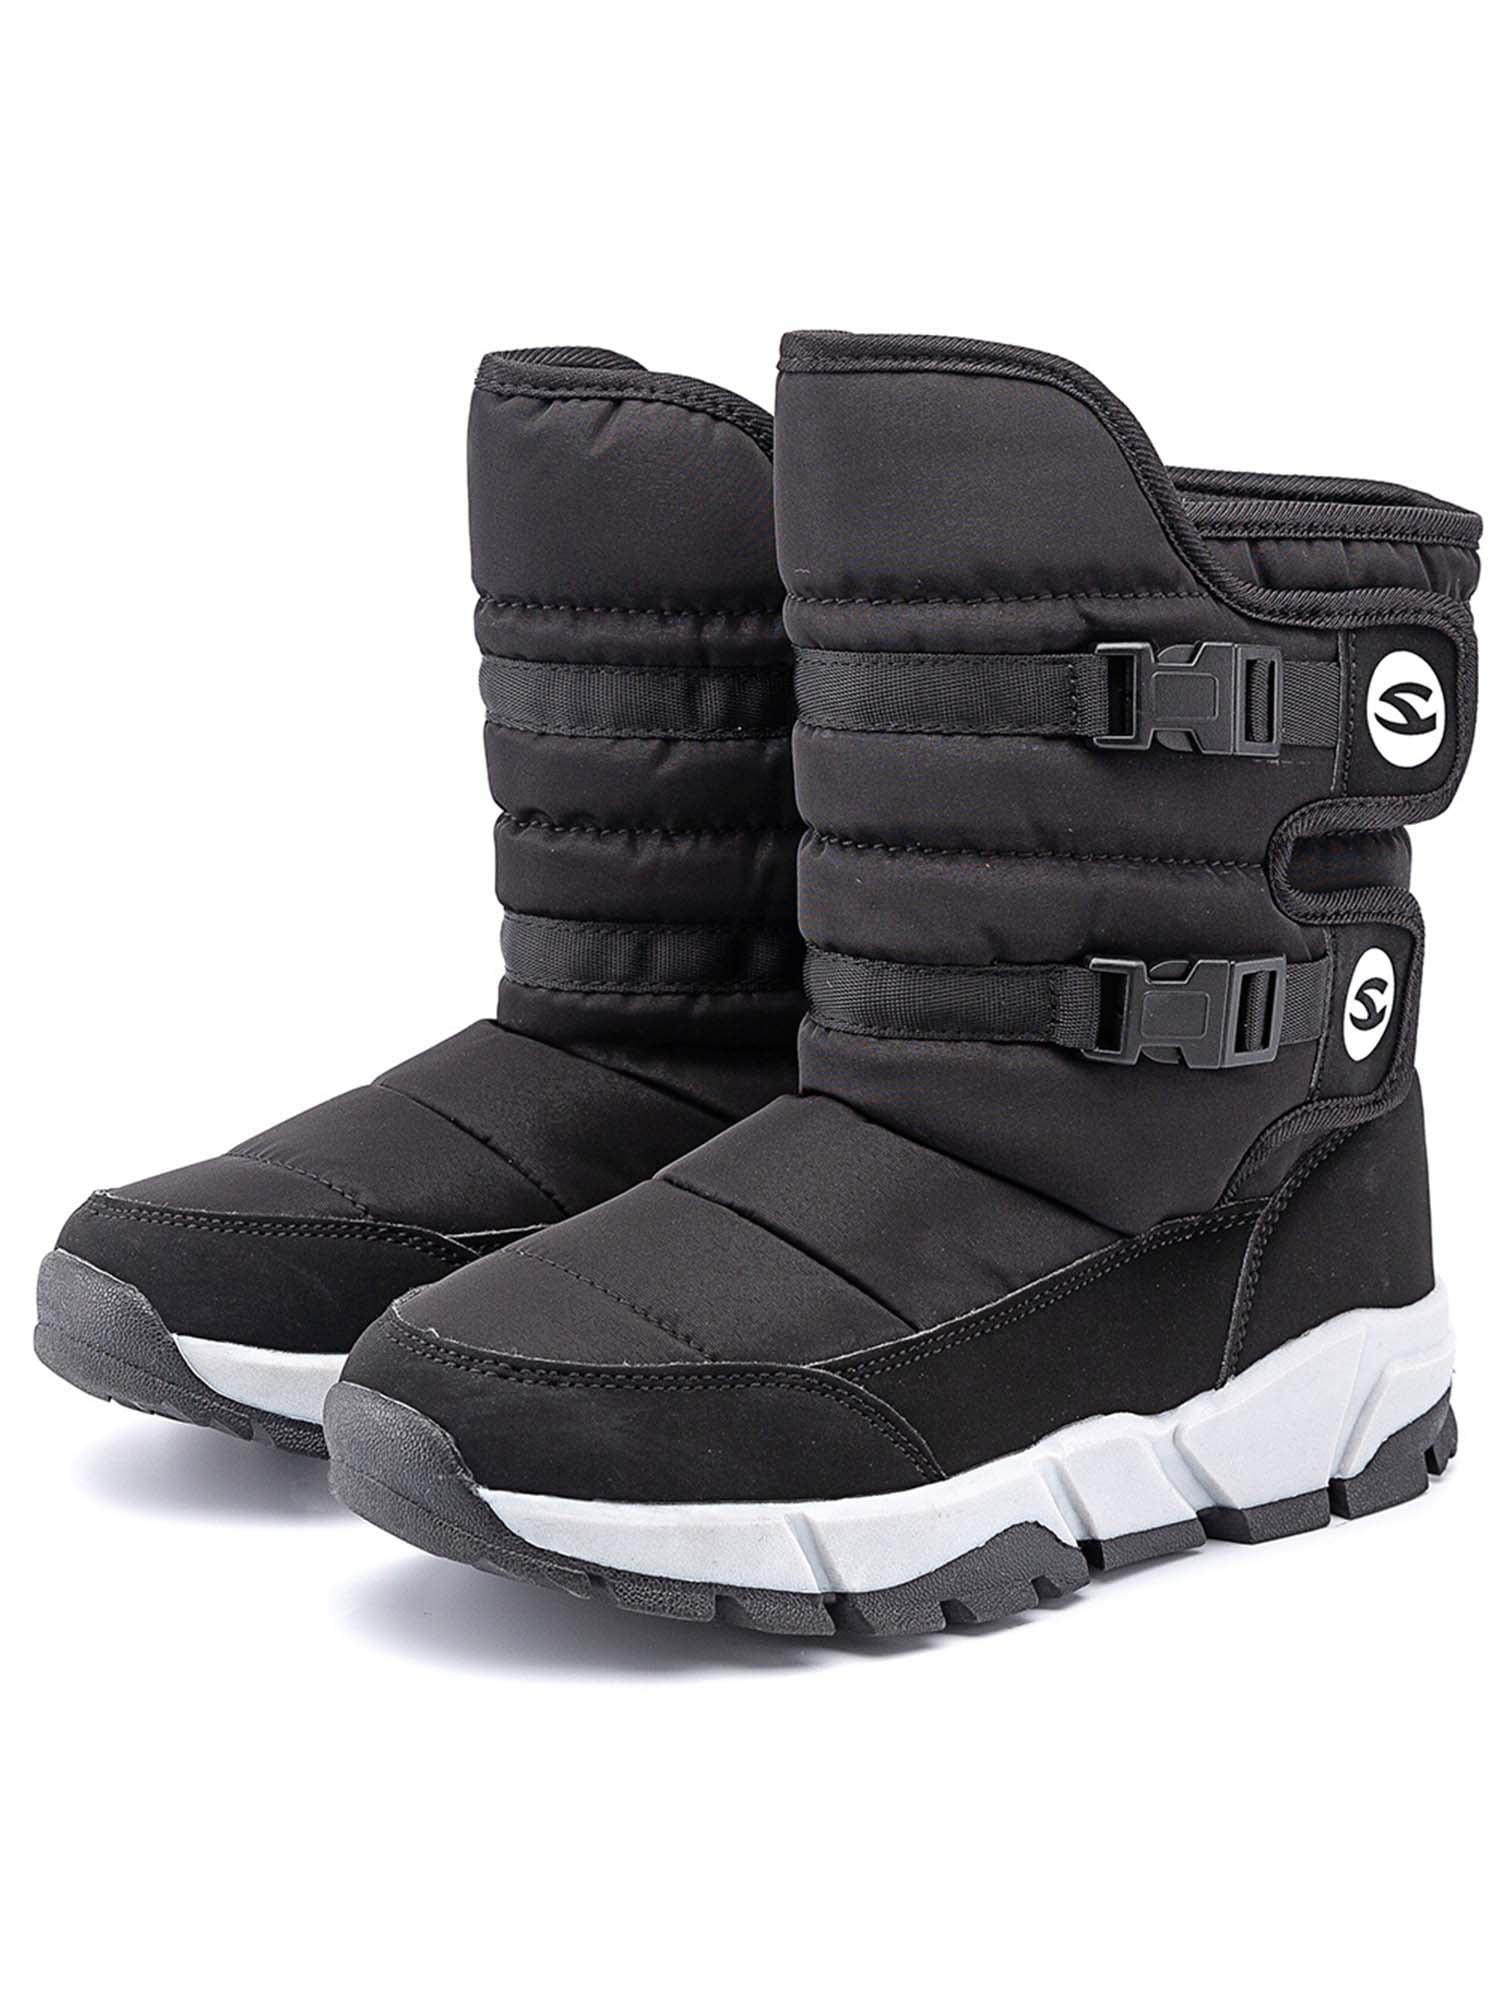 Kids Boys Girls Winter Snow Boots Waterproof Outdoor Warm Faux Fur Lined Shoes